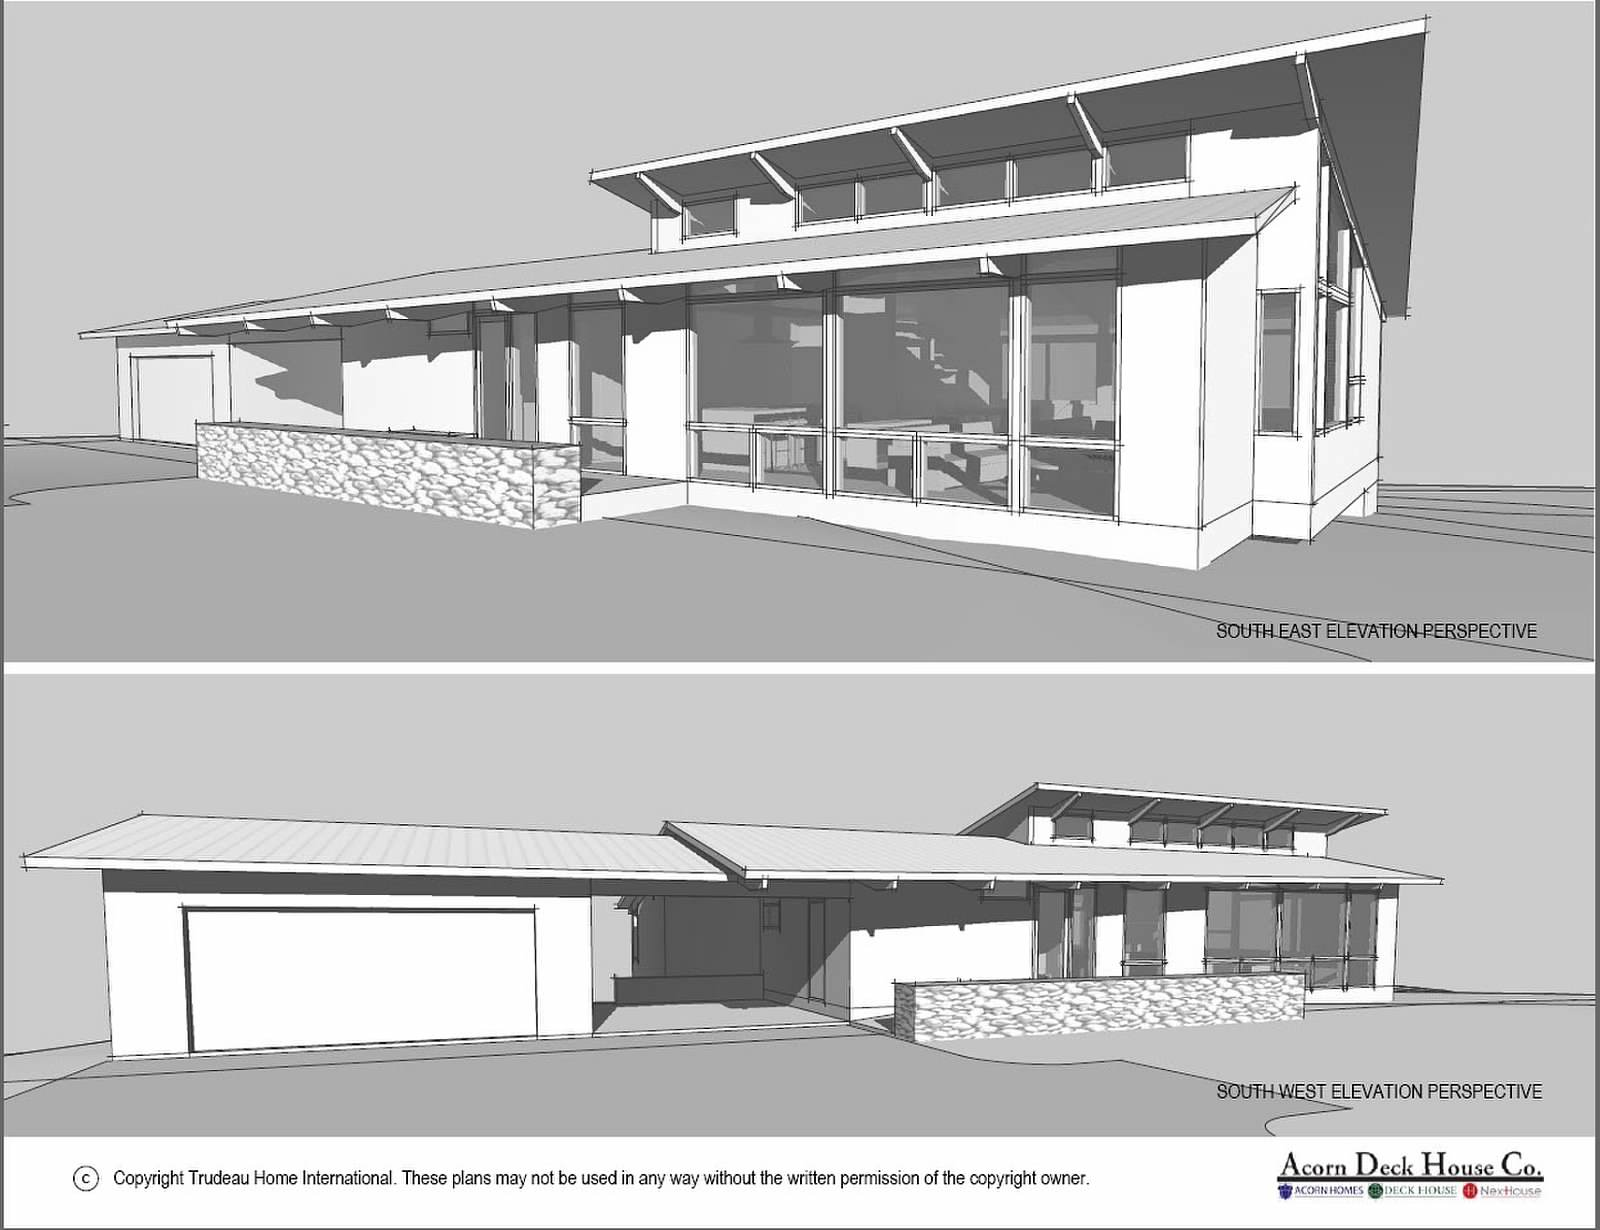 Design philosophy series building a mid century modern for Mid century modern design principles